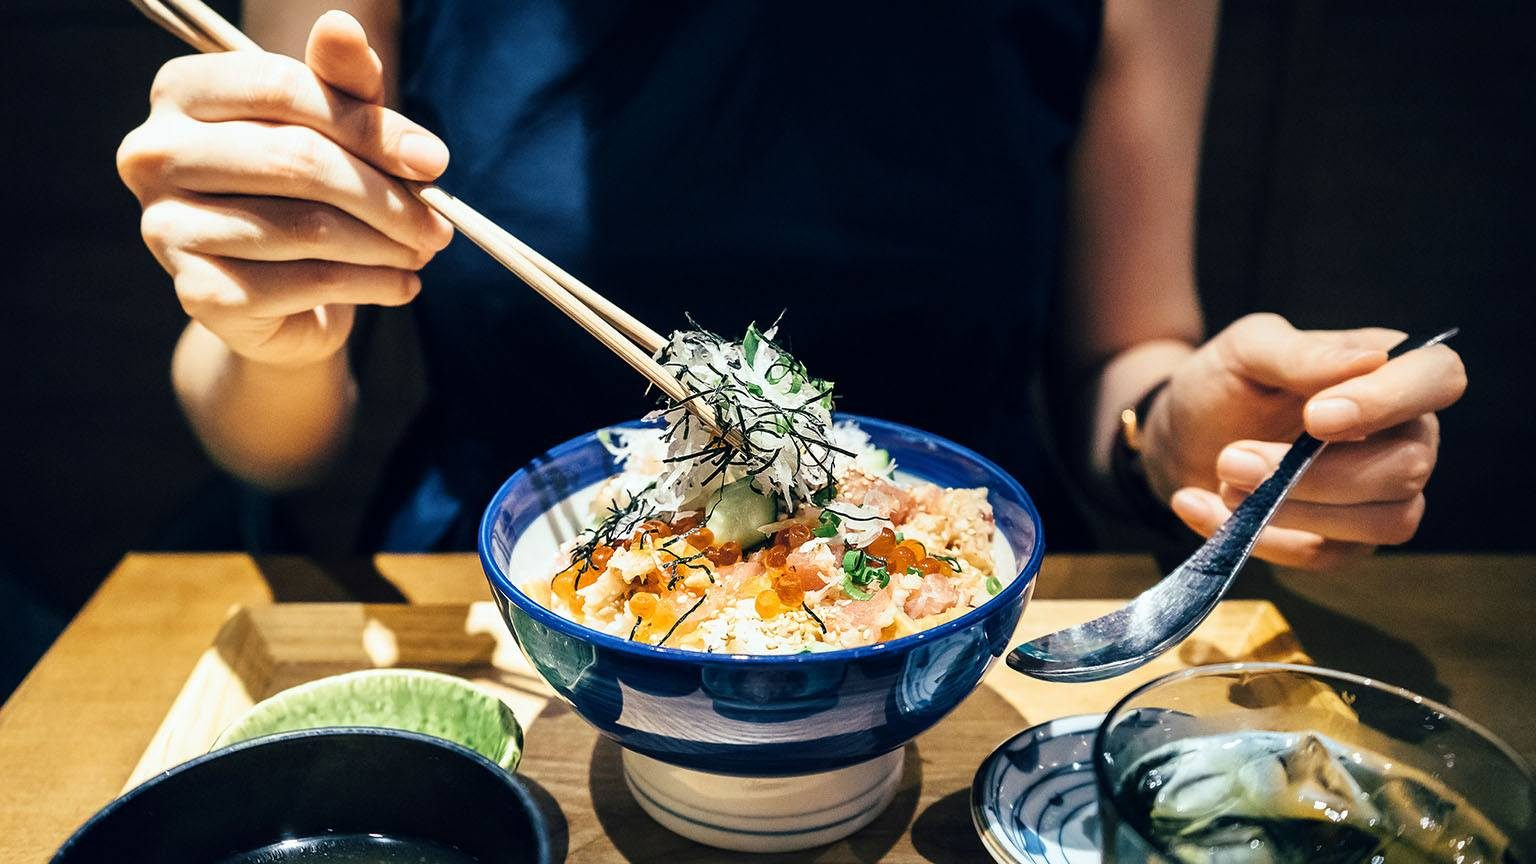 Enjoying japanese food